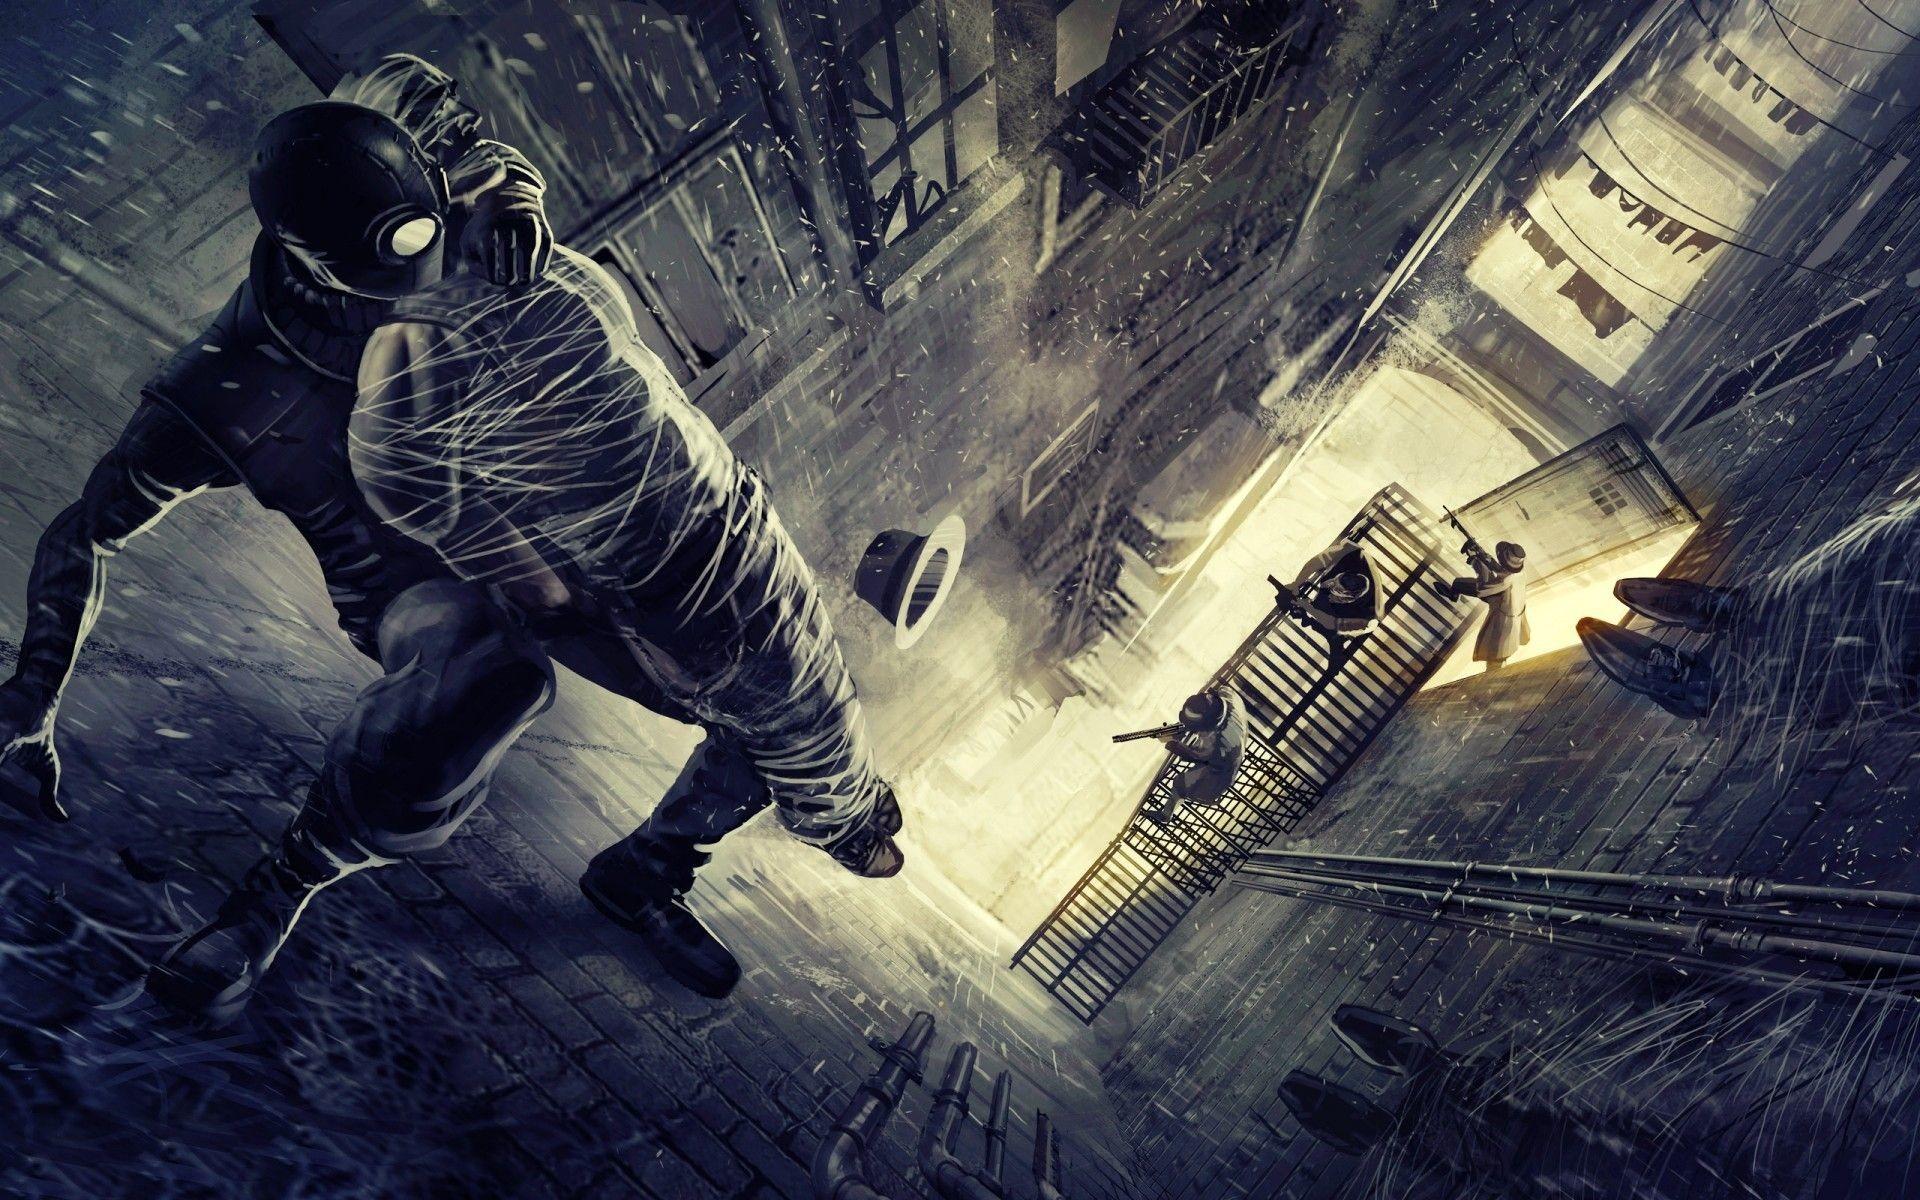 Download Spiderman 3 Movie Wallpaper HD Desktop Mobile Free .